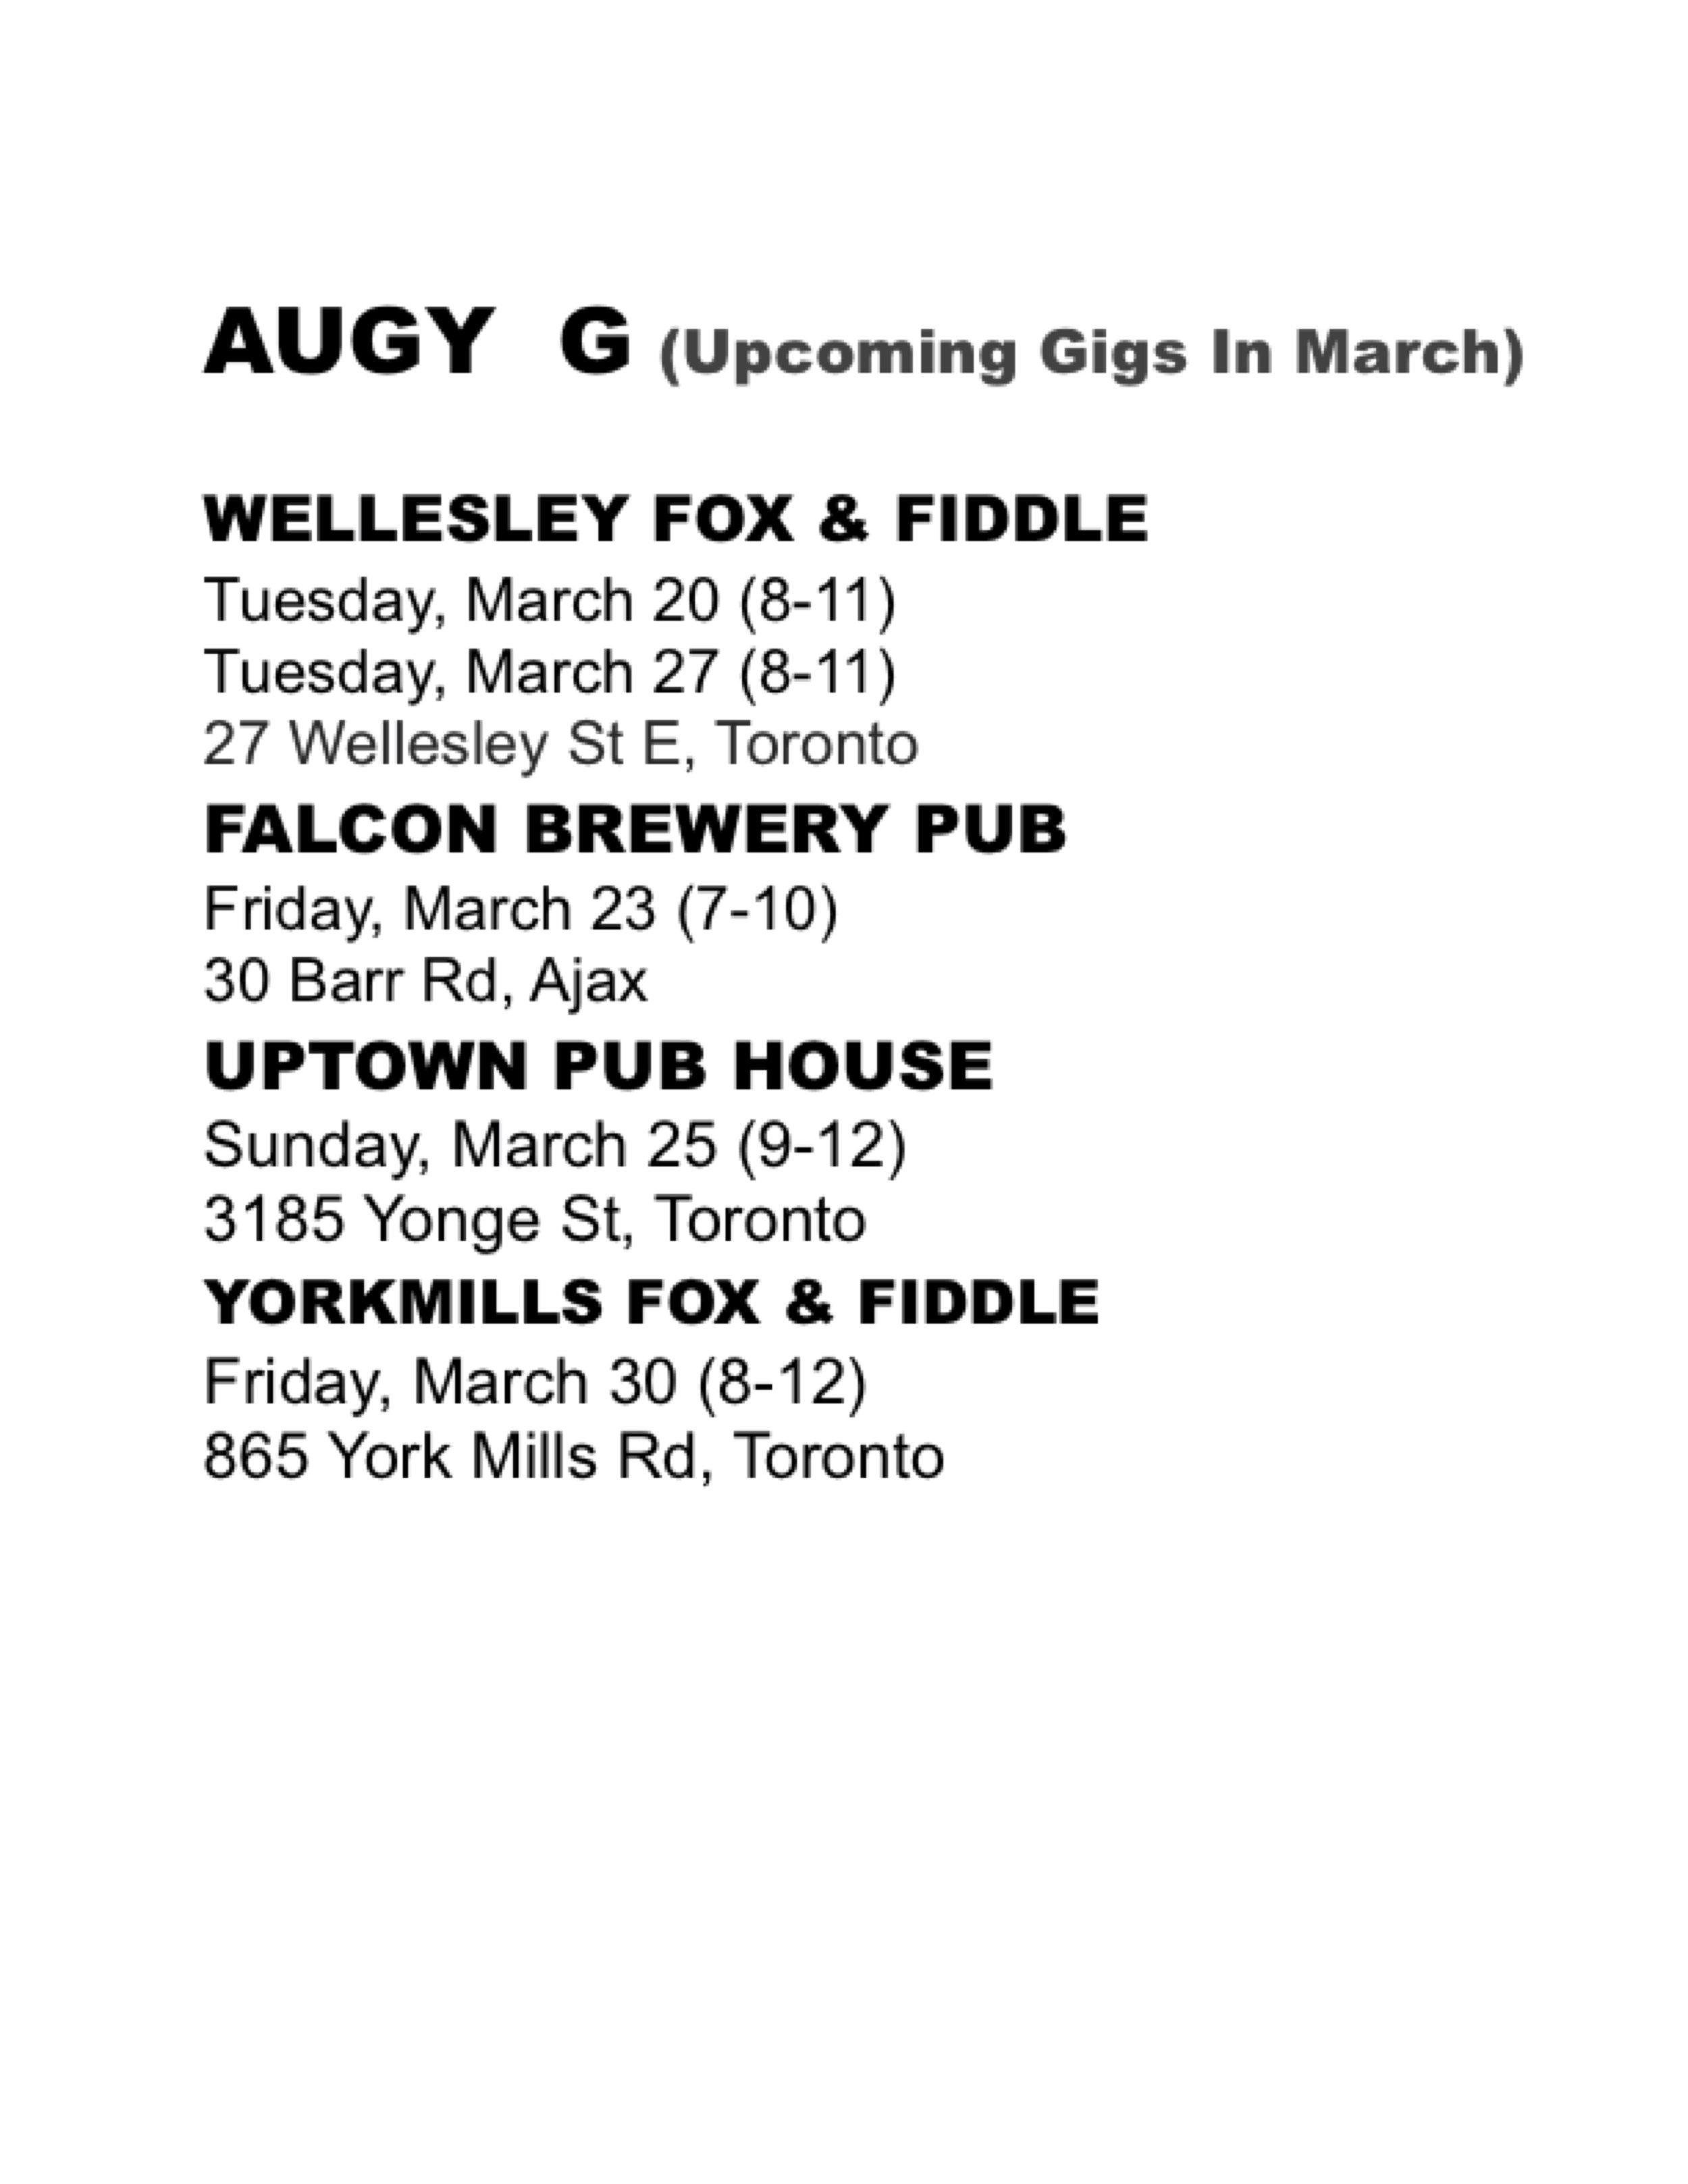 Augy G Upcoming gigs.jpg